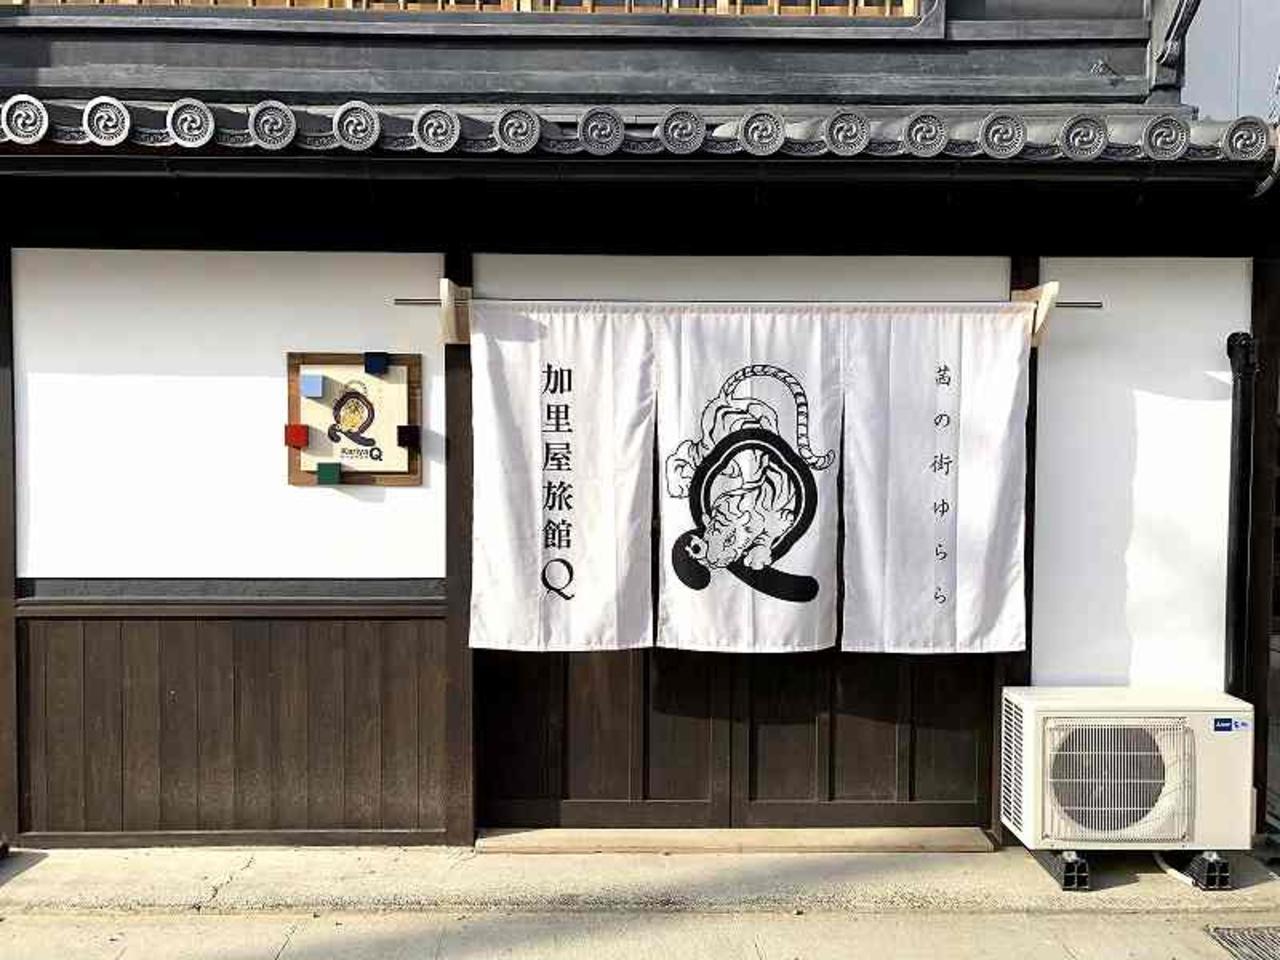 【 KARIYA RYOKAN Q 】宿泊施設(兵庫県赤穂市)5月オープン